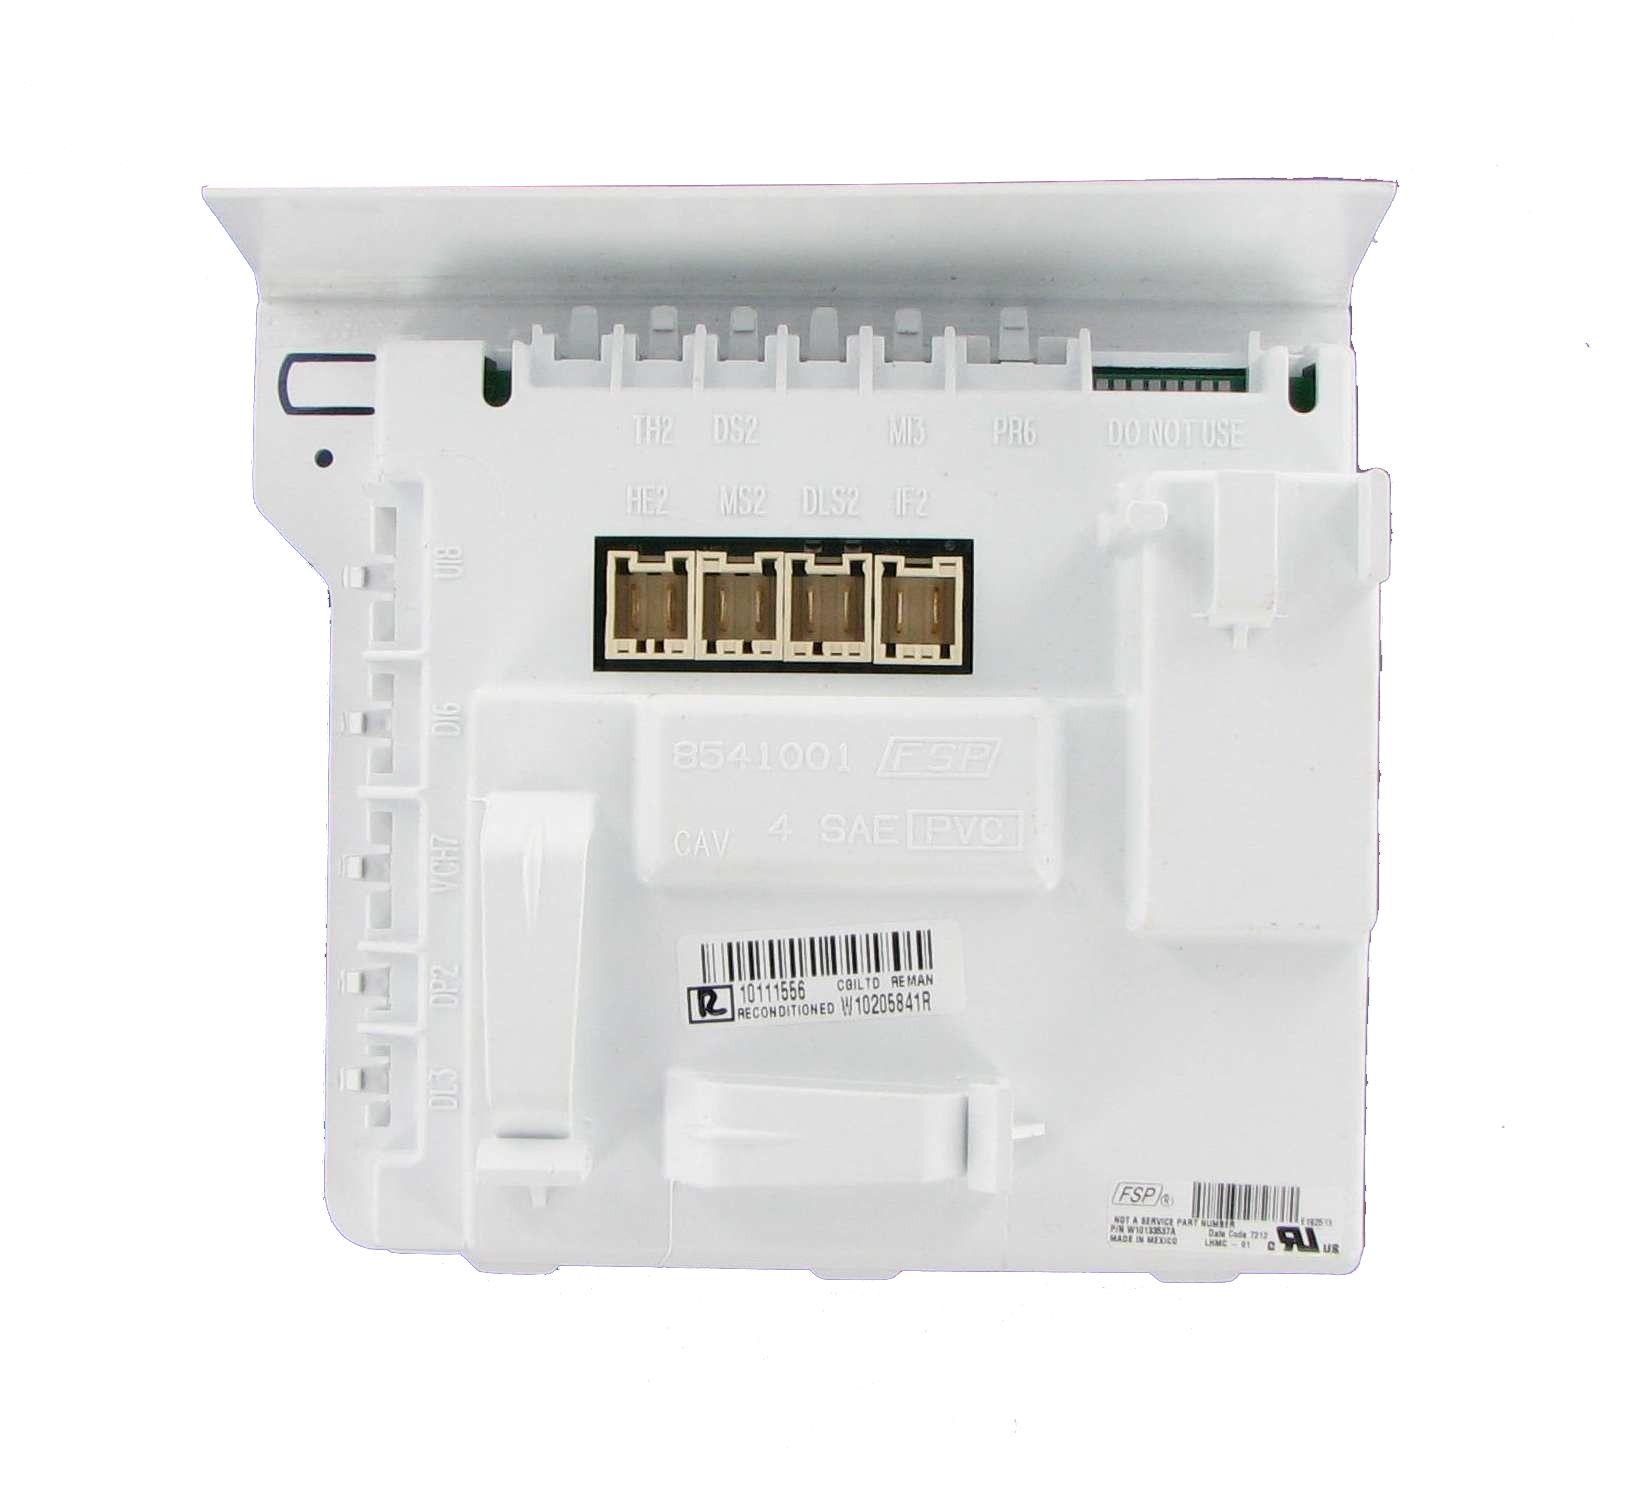 Whirlpool W10205841 / WPW10205841 Washer Electronic